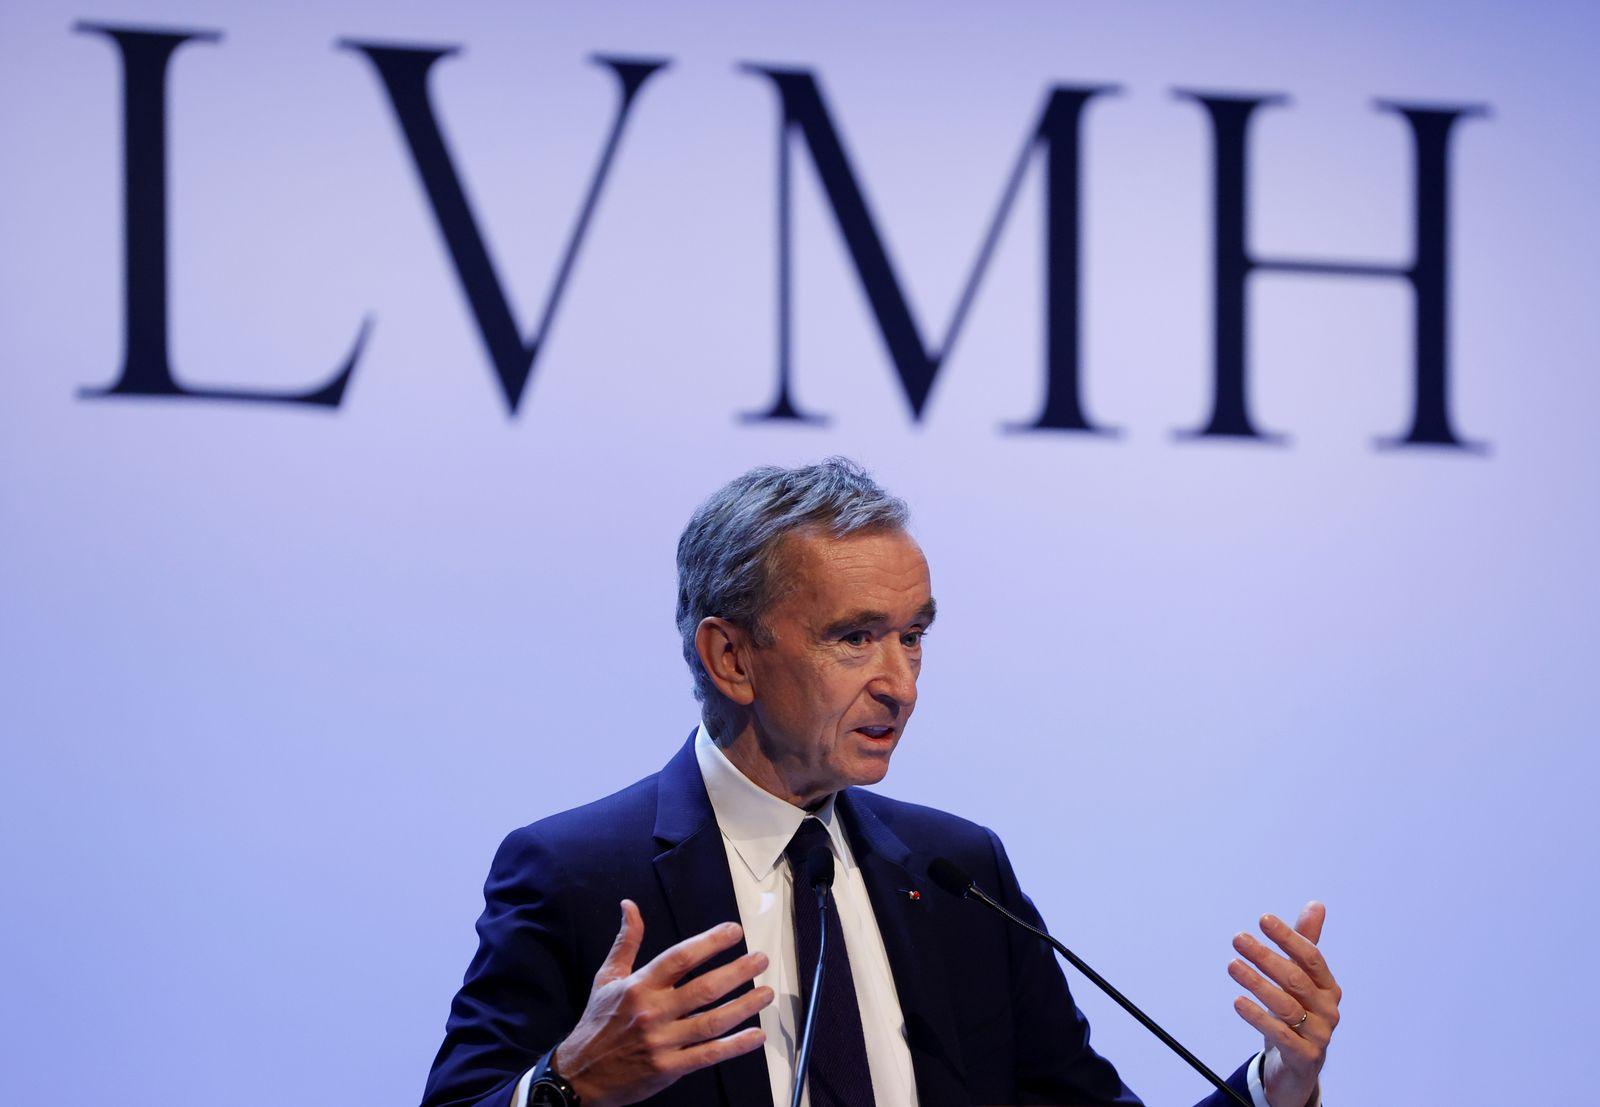 FILE PHOTO: LVMH luxury group Chief Executive Bernard Arnault announces their 2019 results in Paris